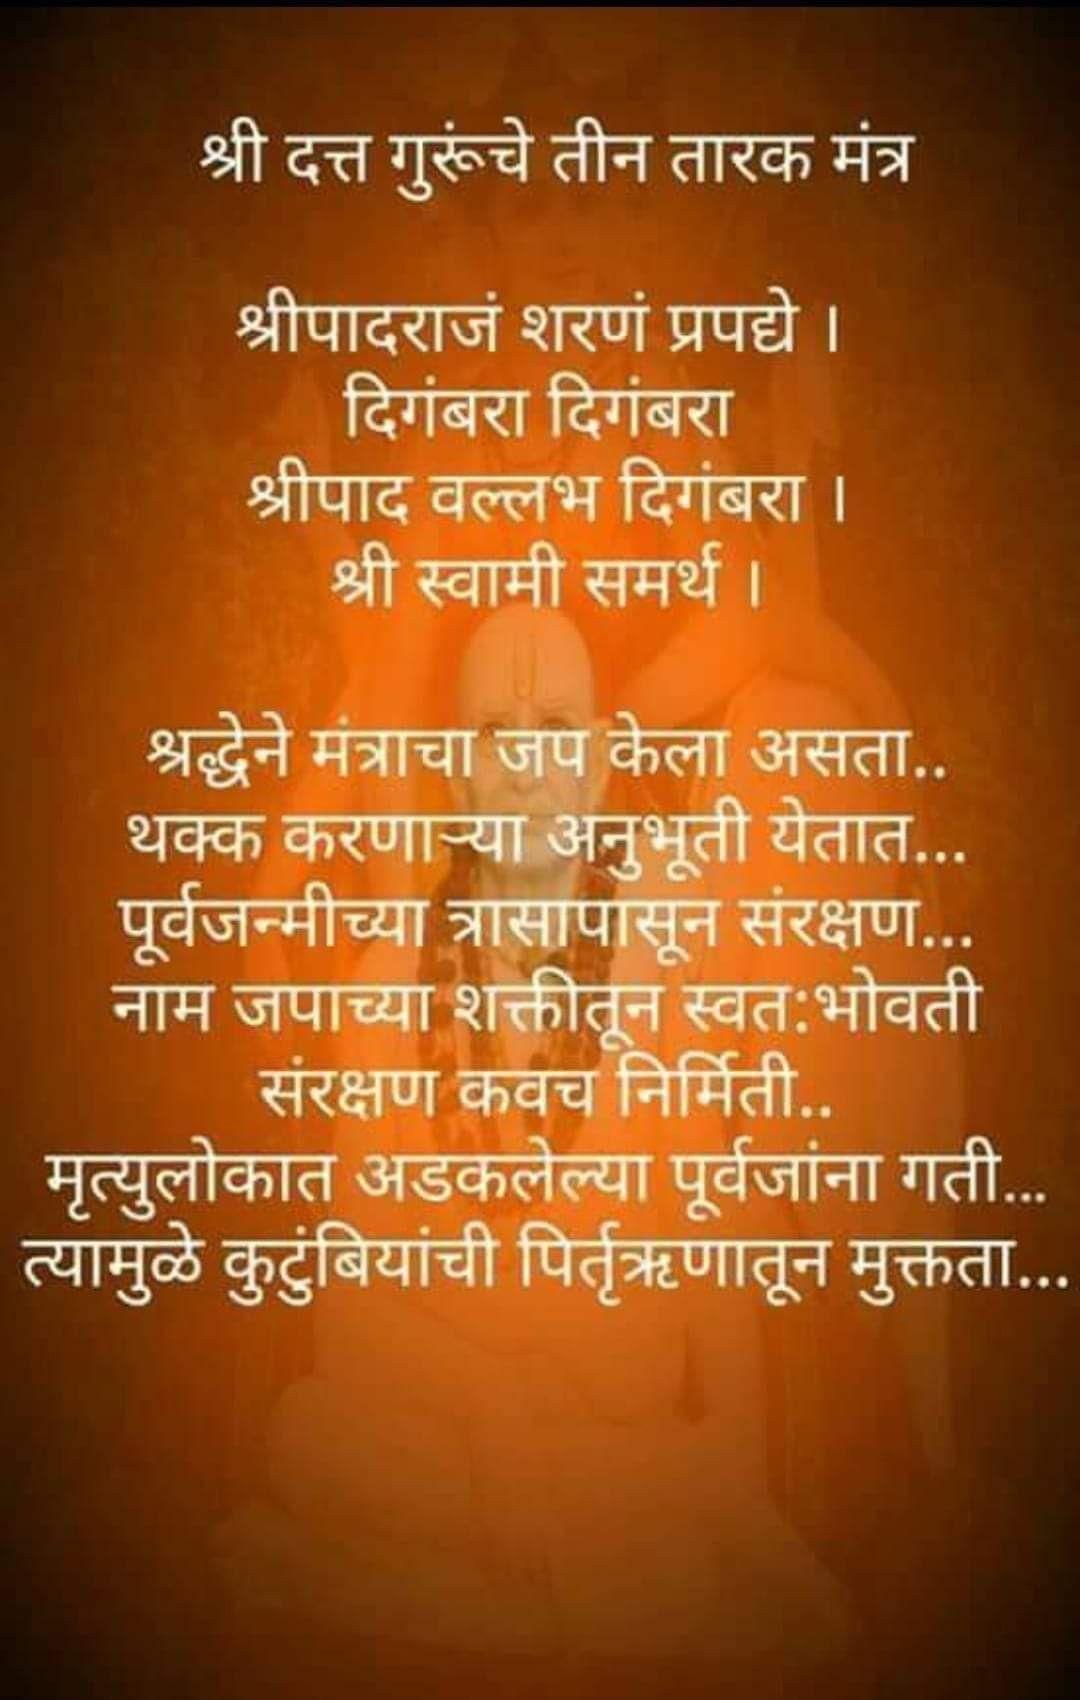 Shree Swami Samarth (With images) | Swami samarth, Morning ...